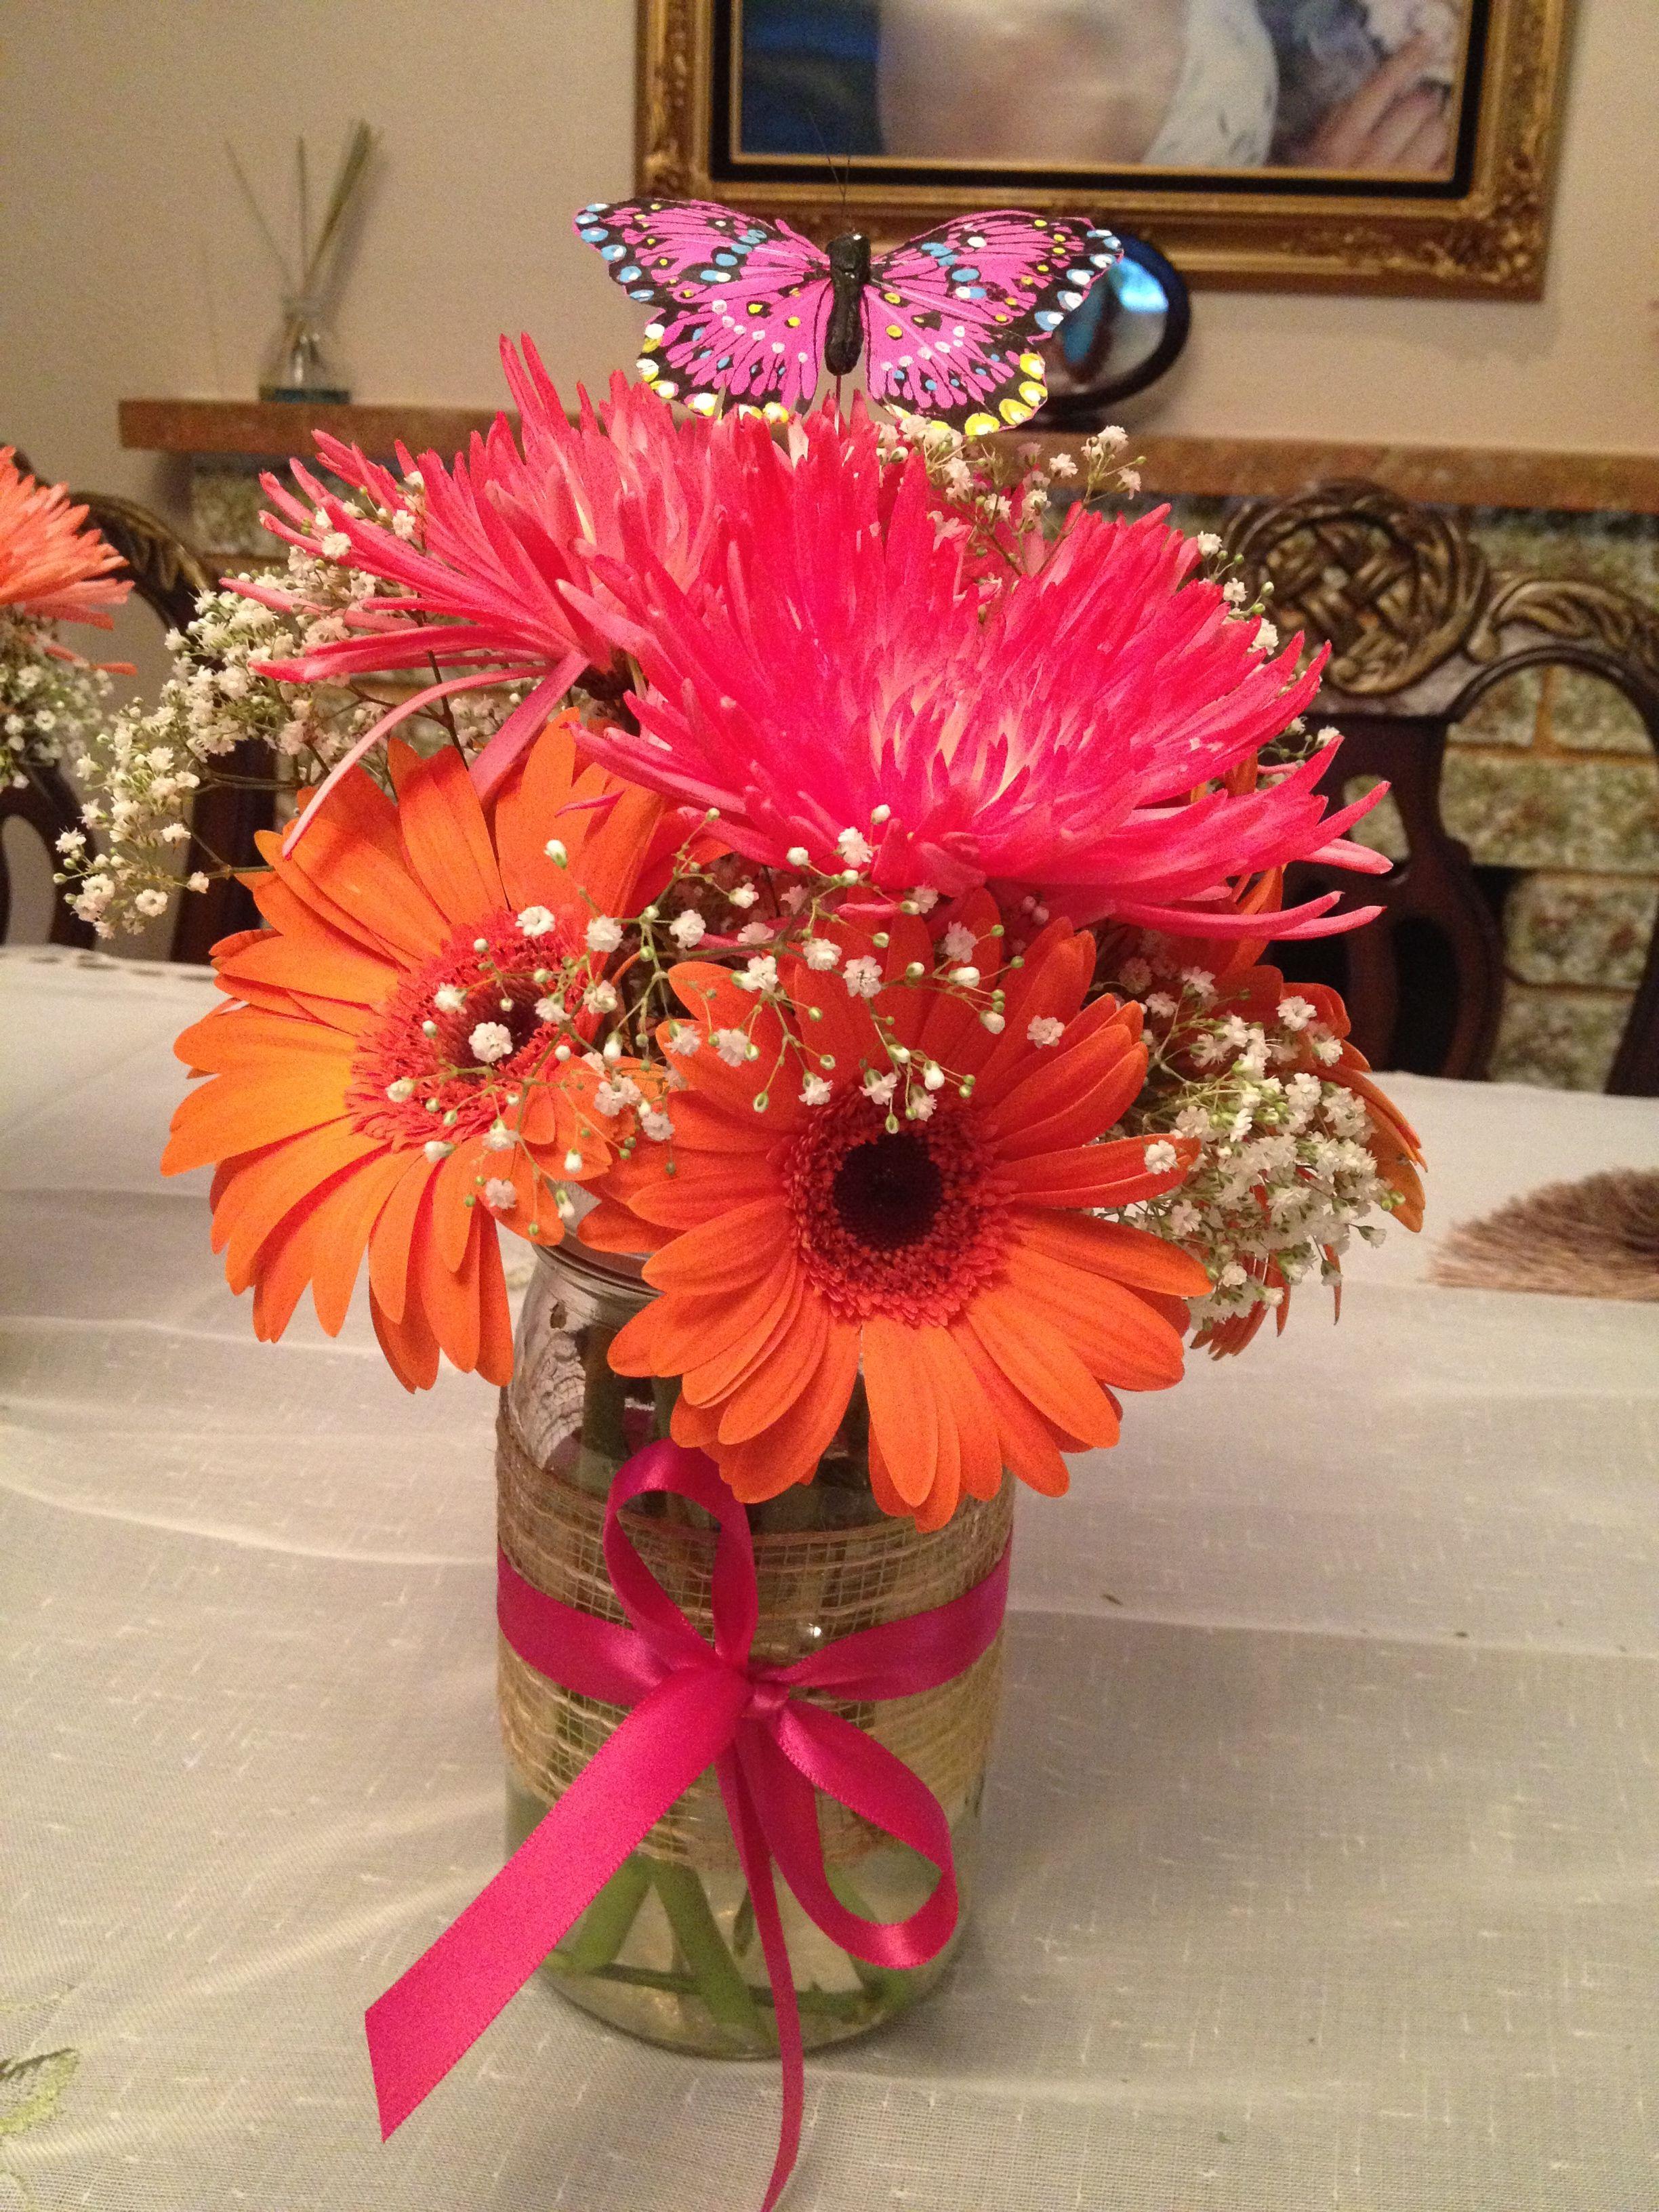 Gerber Daisies And Spider Mums In A Mason Jar Gerber Daisy Wedding Centerpieces Wedding Brunch Reception Mason Jar Flowers